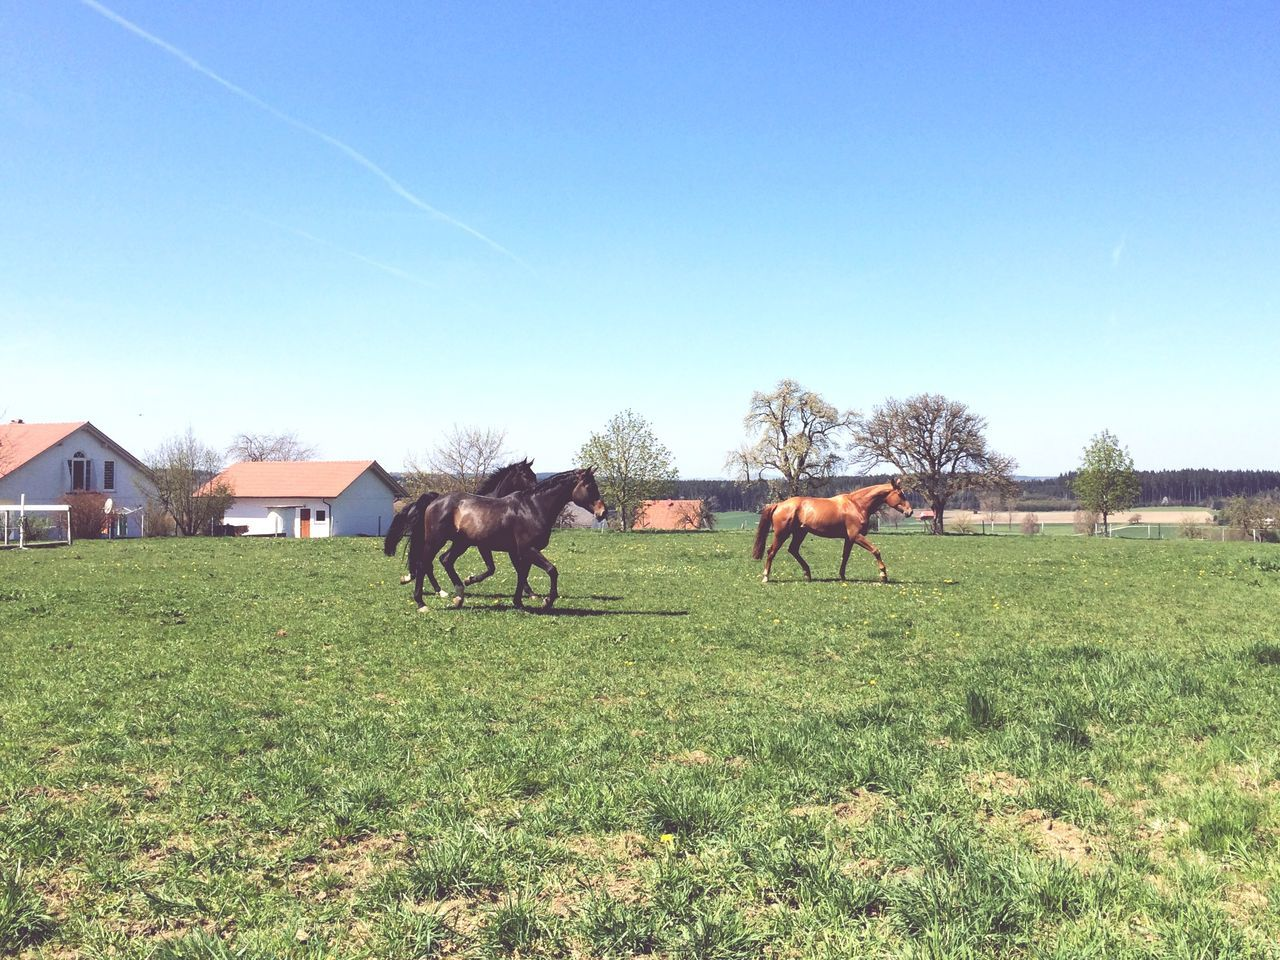 Horses Running Galopp Horsepower Horse I Love Horses Freedom Free Healthy